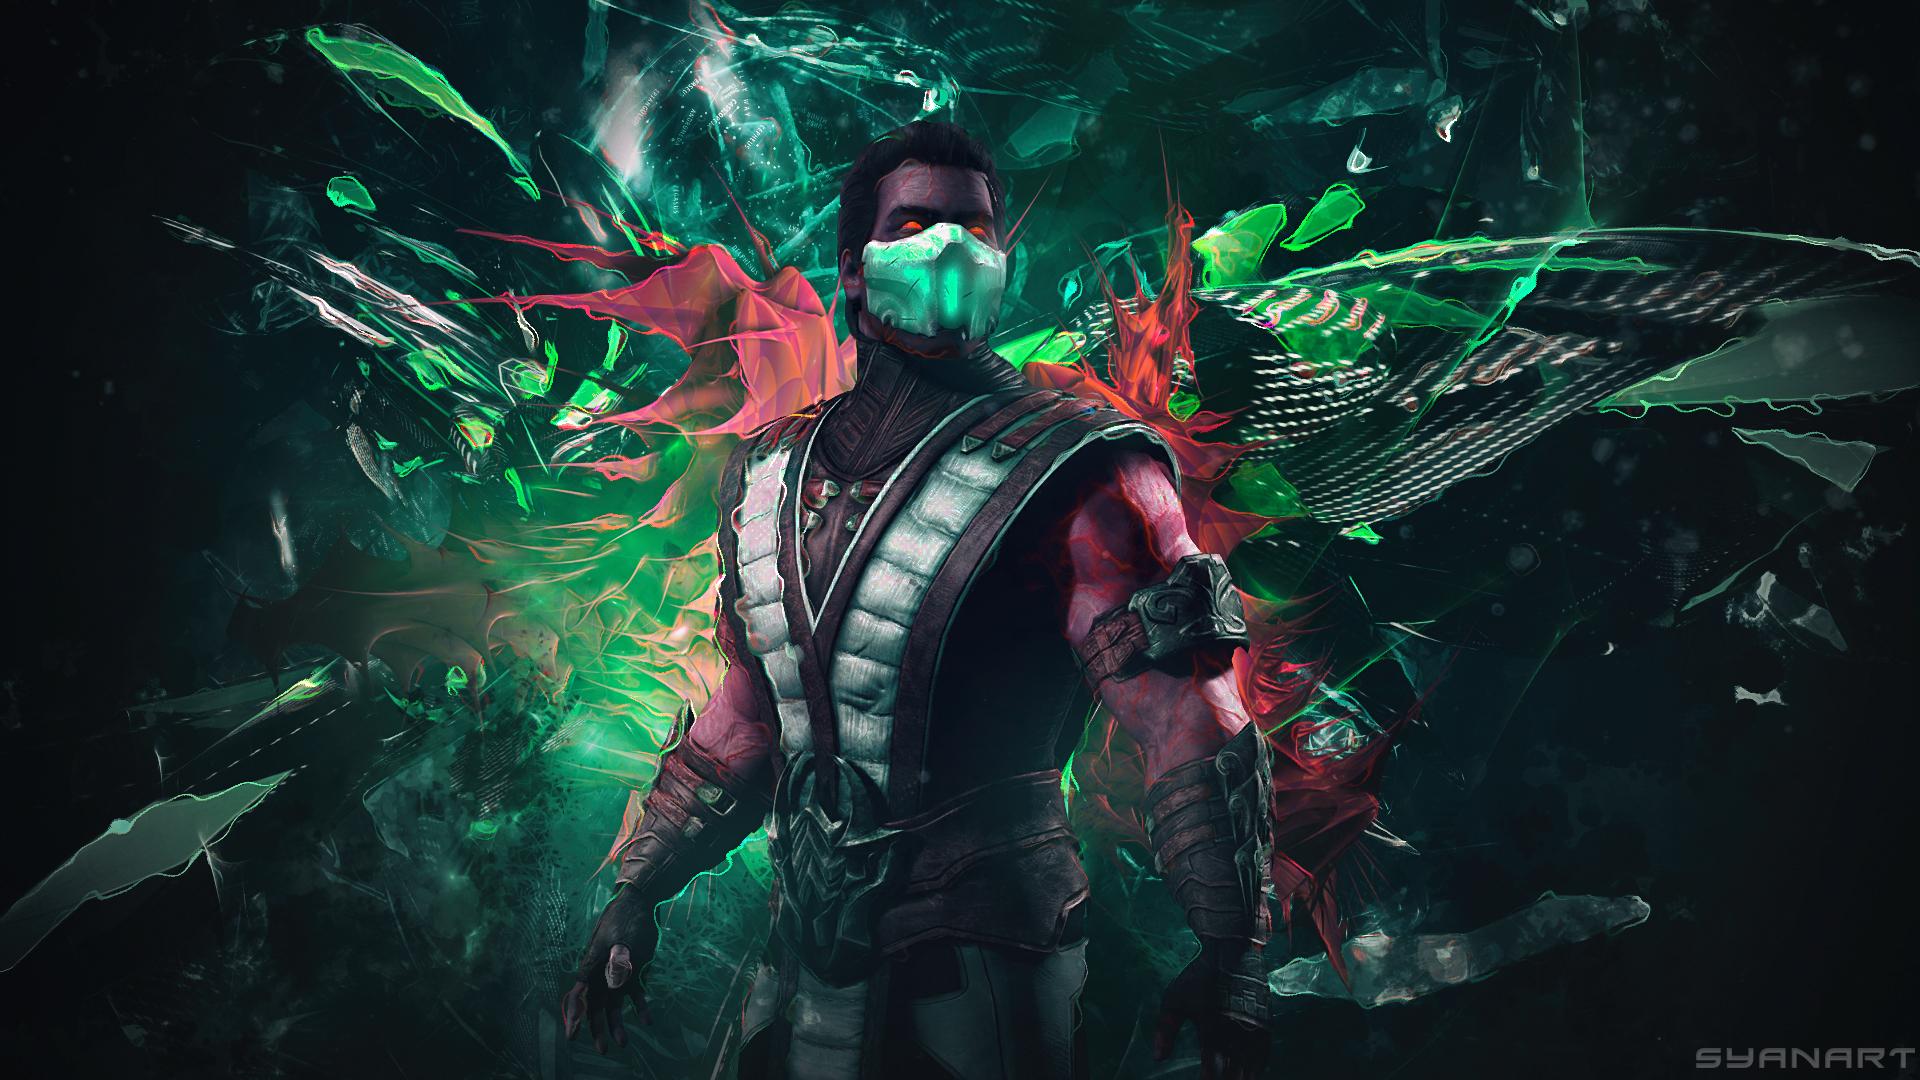 Mortal Kombat Chamaleon wallpaper